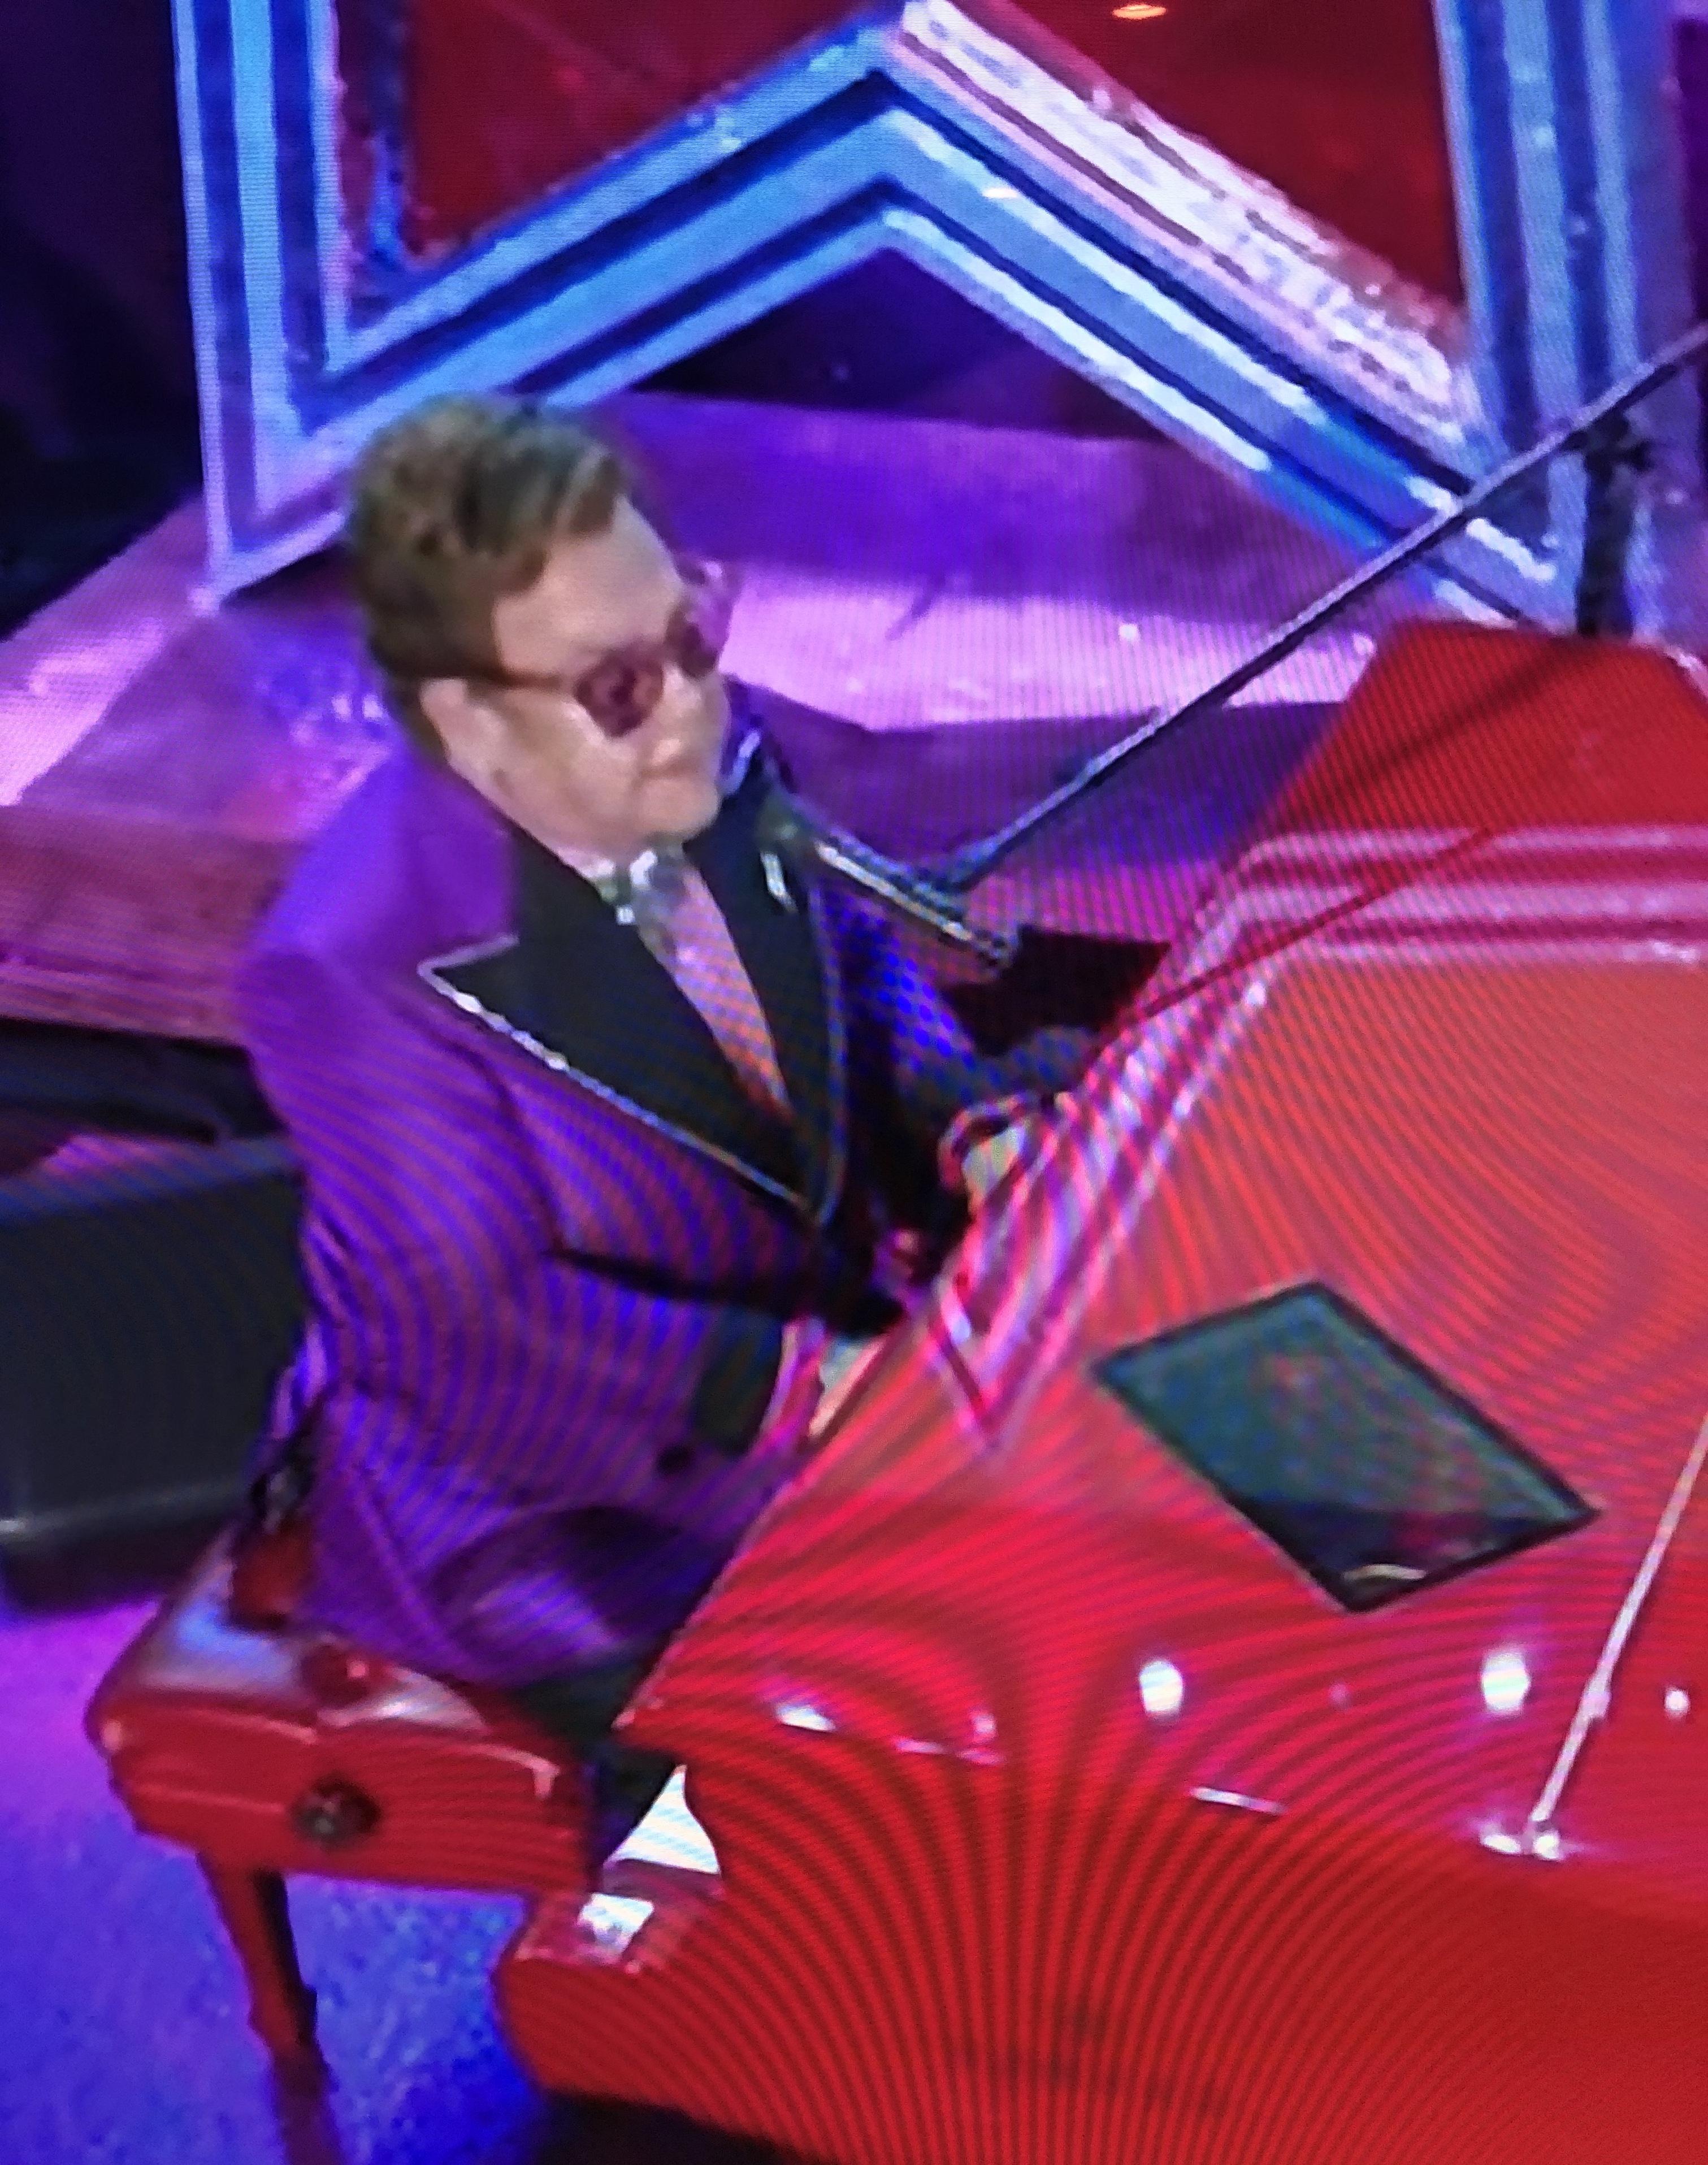 Elton John perfroming at the Oscars